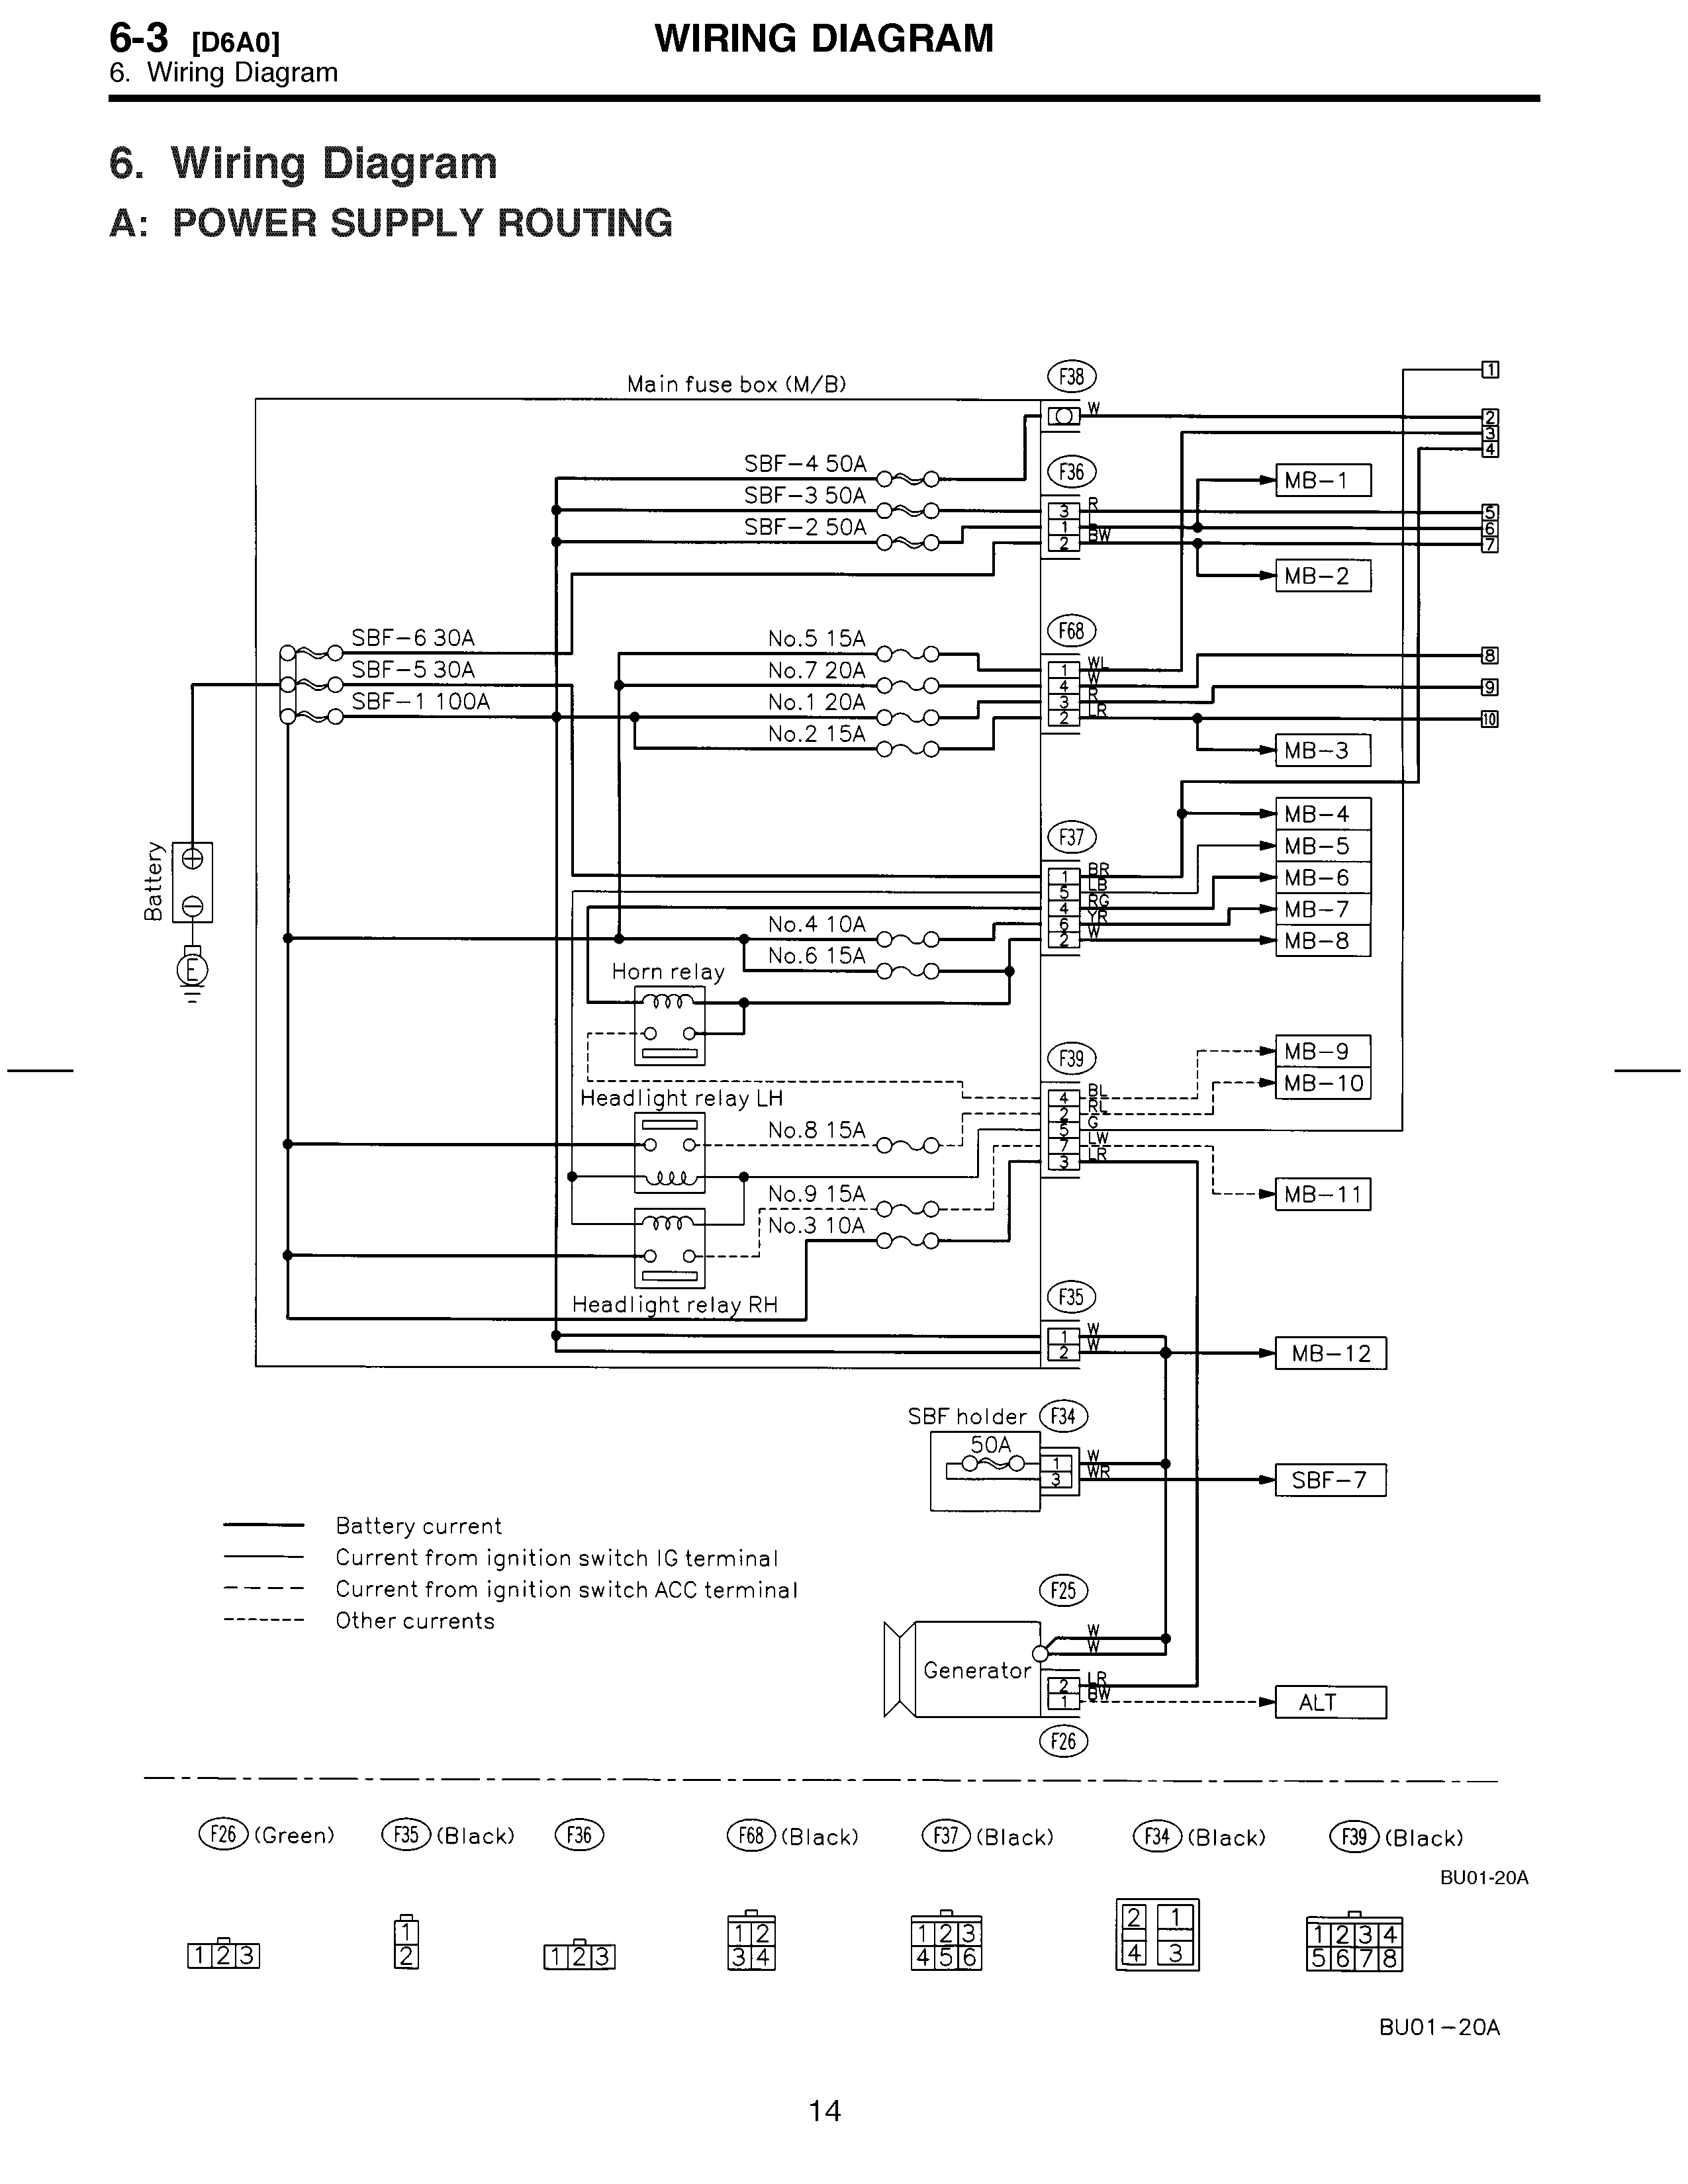 2000 subaru outback stereo wiring diagram 2000 subaru outback headlight wiring diagram